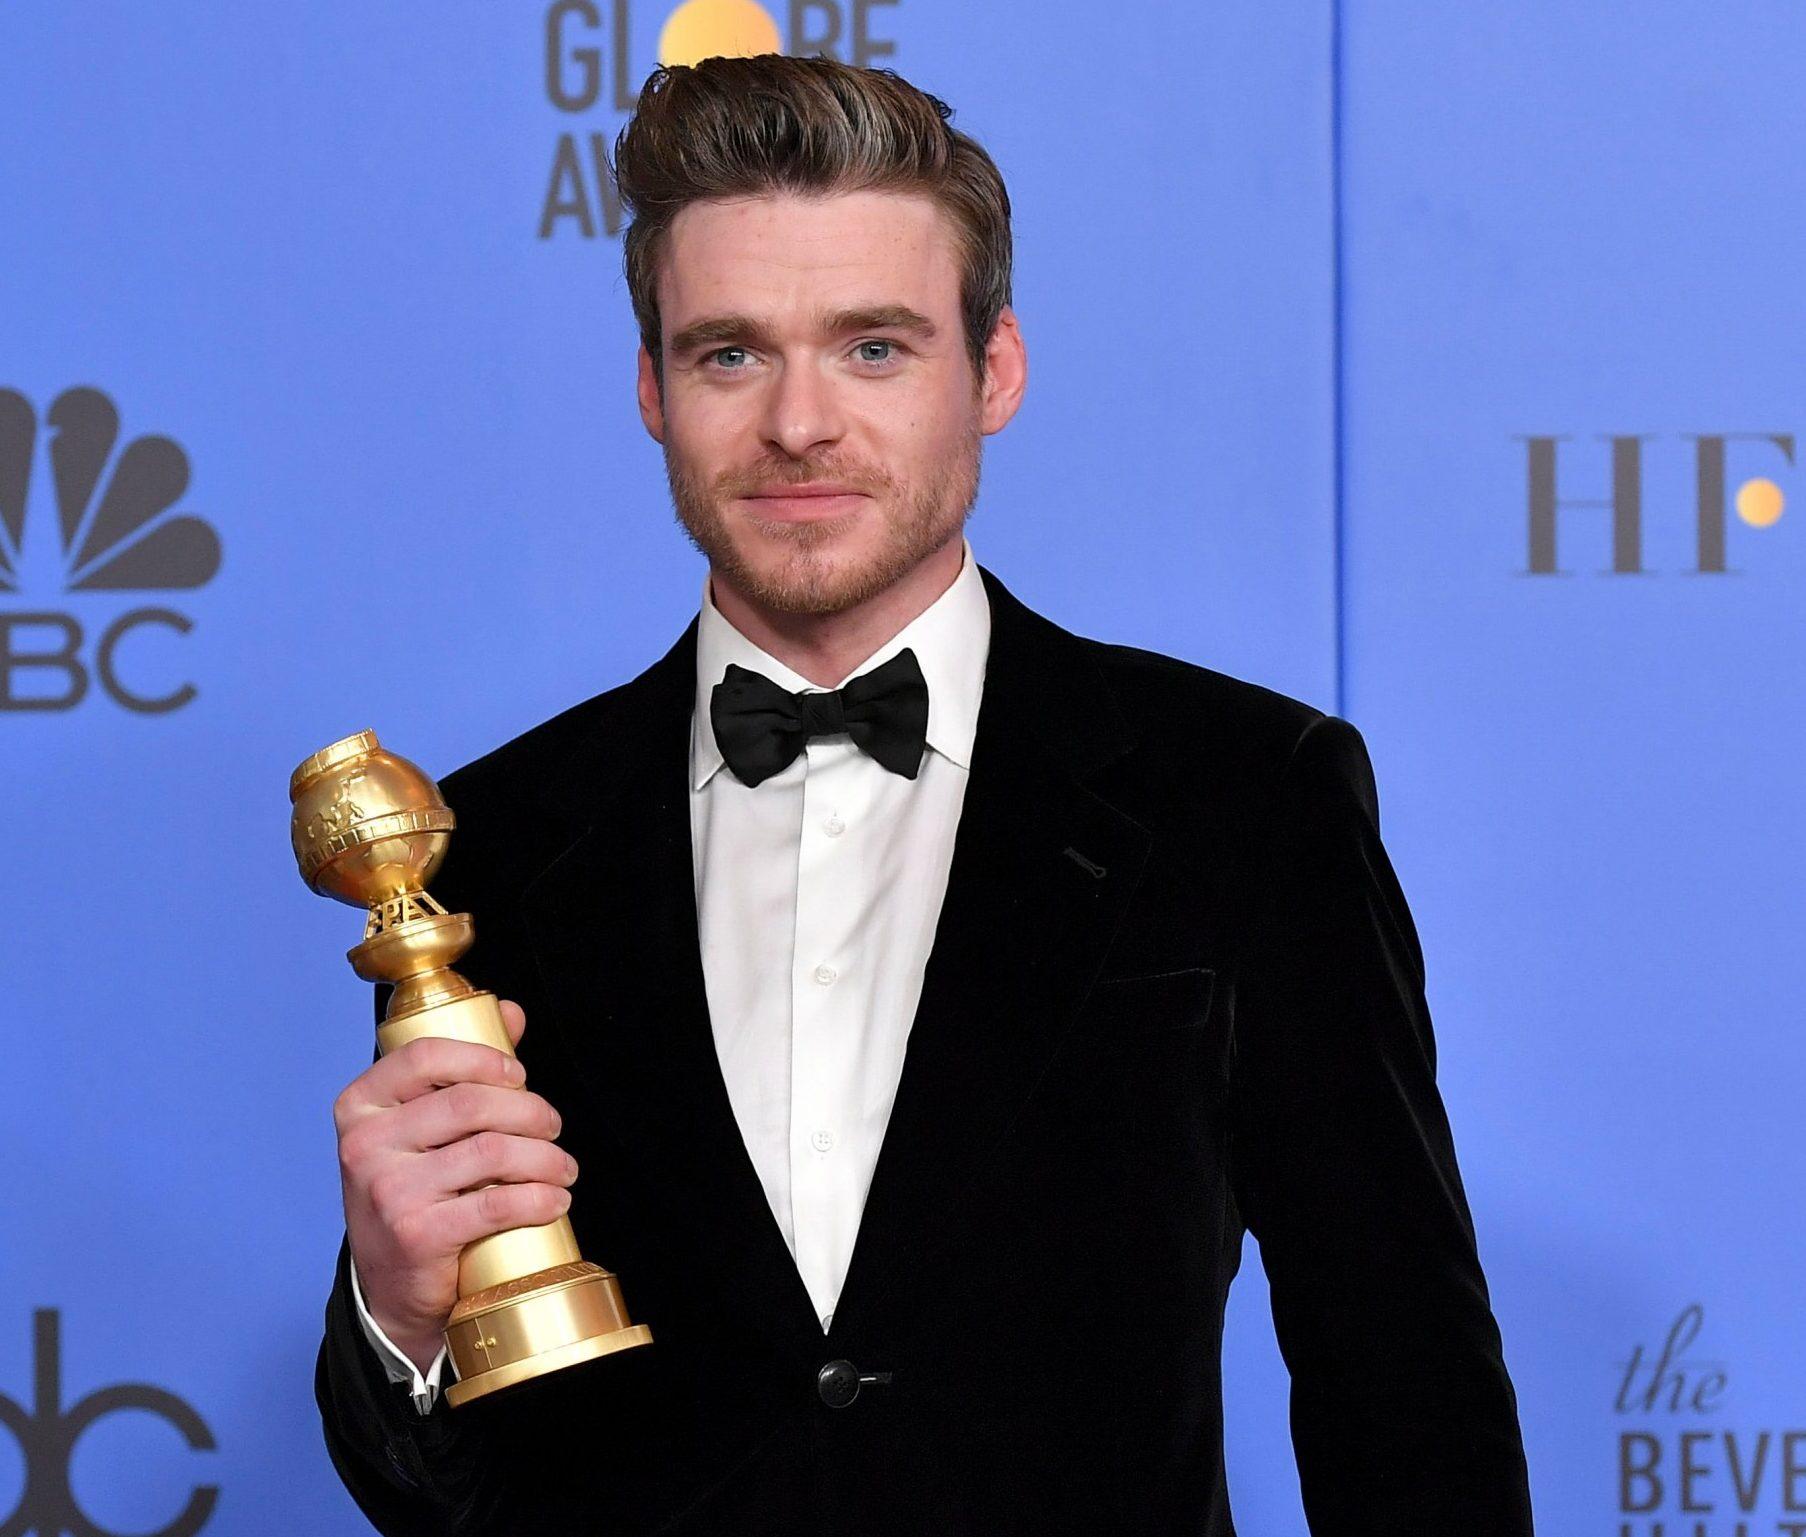 Bodyguard's Richard Madden channels James Bond at Golden Globes amid 007 'rumours'